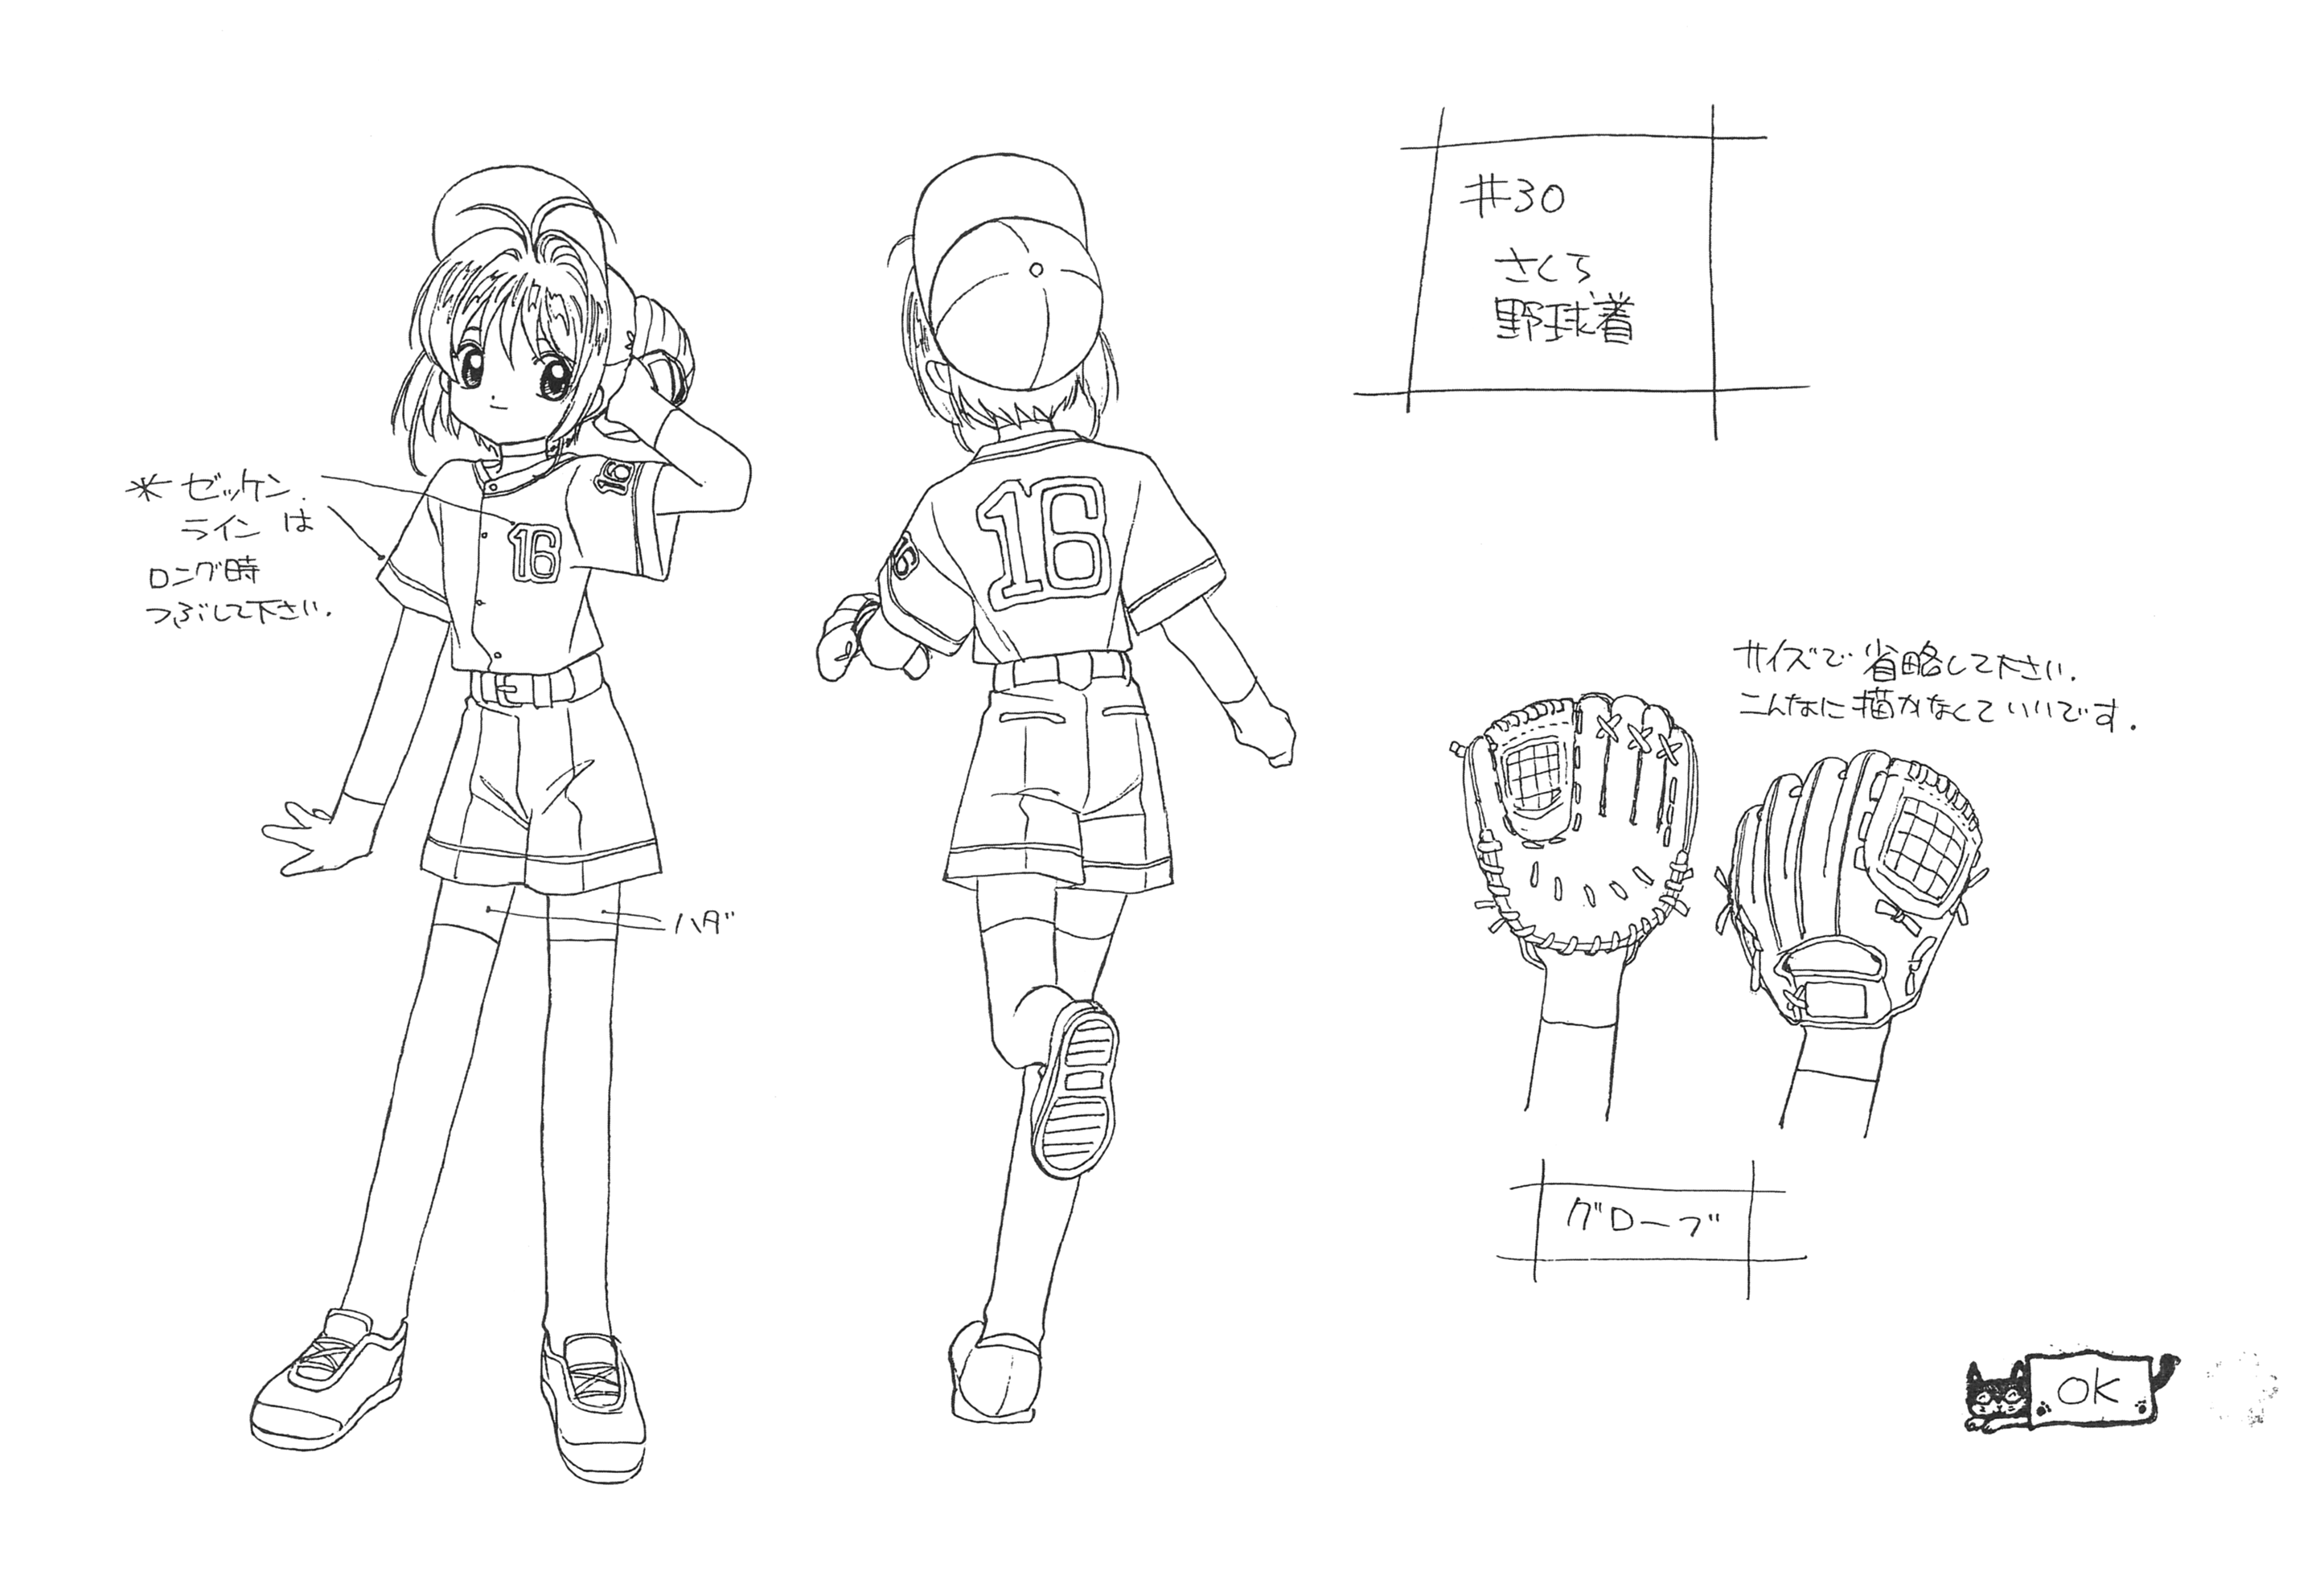 Cardcaptor Sakura Animated Works Special Edition Cardcaptor Sakura Sakura Cosplay Sakura